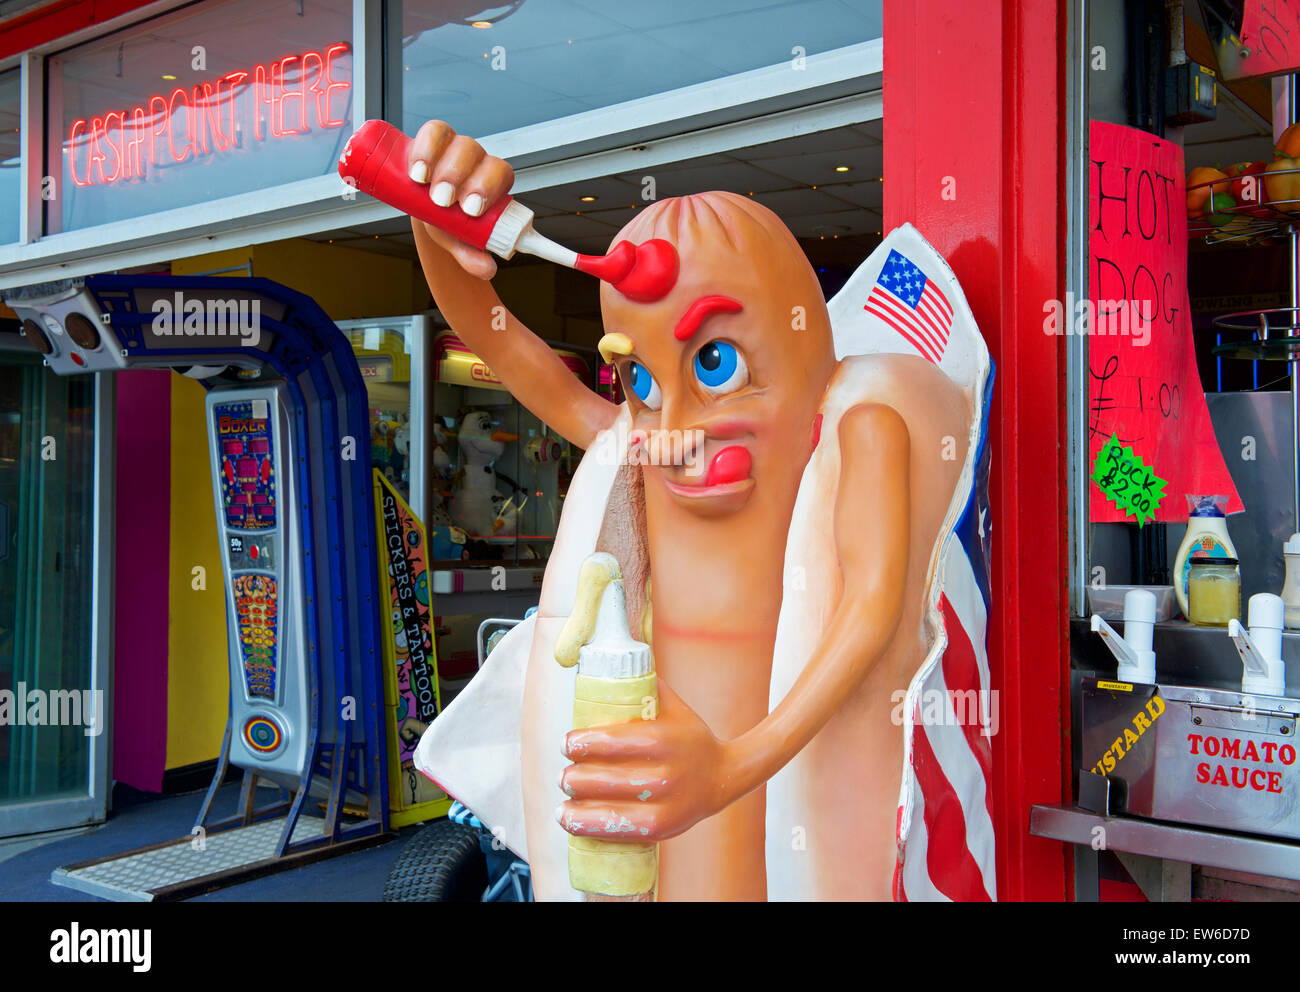 Kitch figure outside hotdog stand, Bridlington, East Yorkshire, England UK - Stock Image